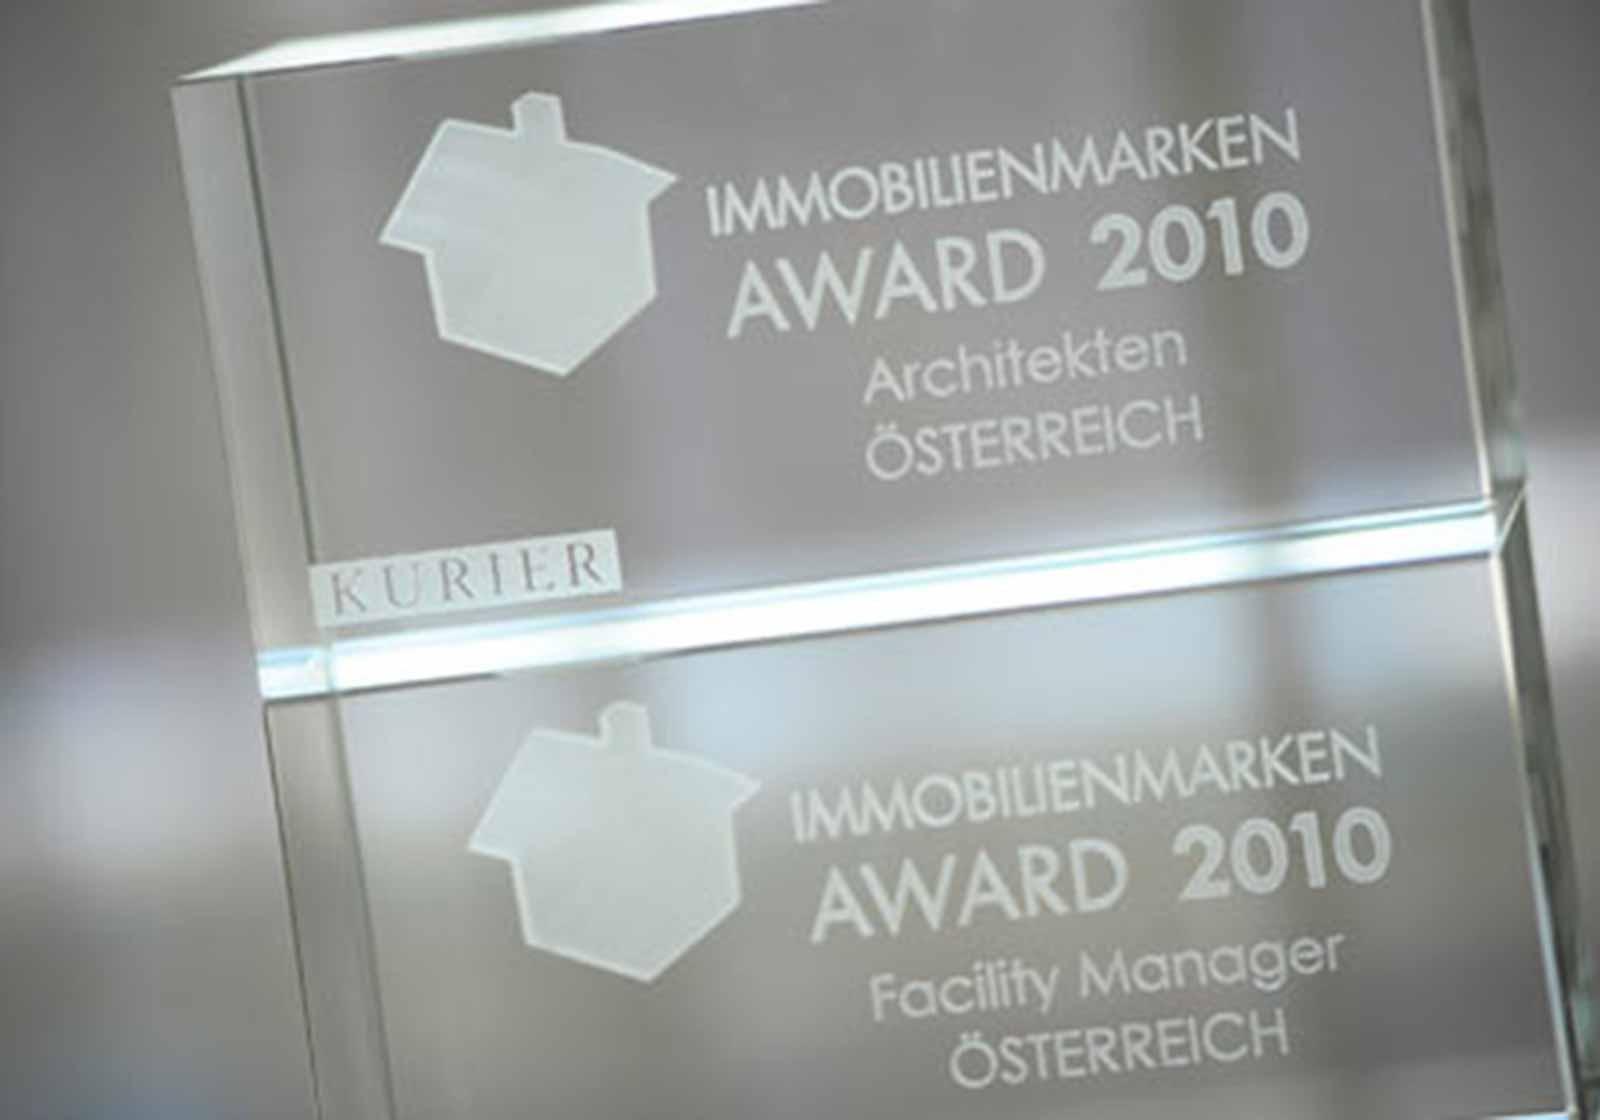 Immobilienmarken Award